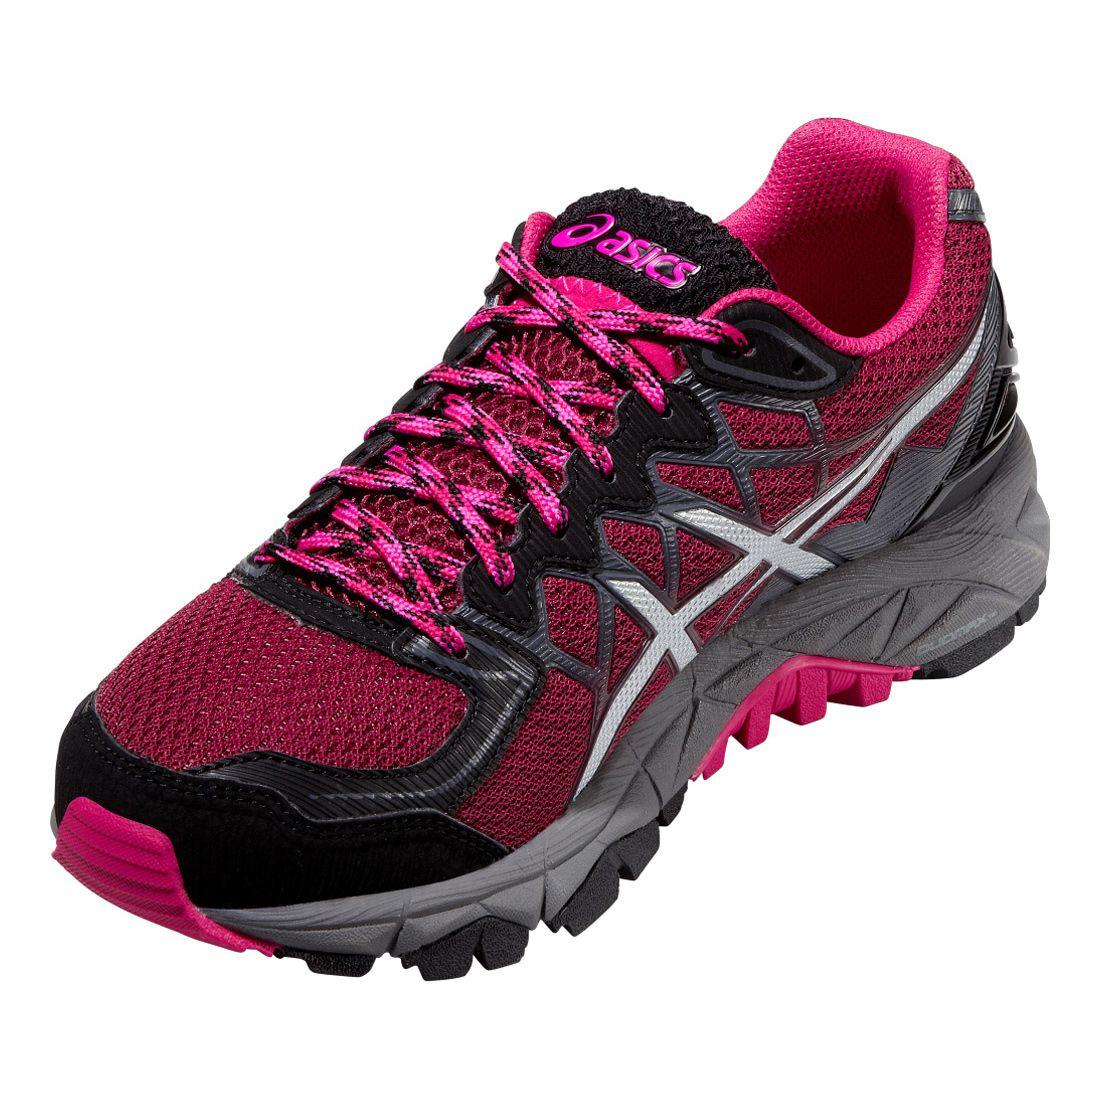 Asics Gel-Zaraca 4 Mens Running Shoes - Sweatband.com